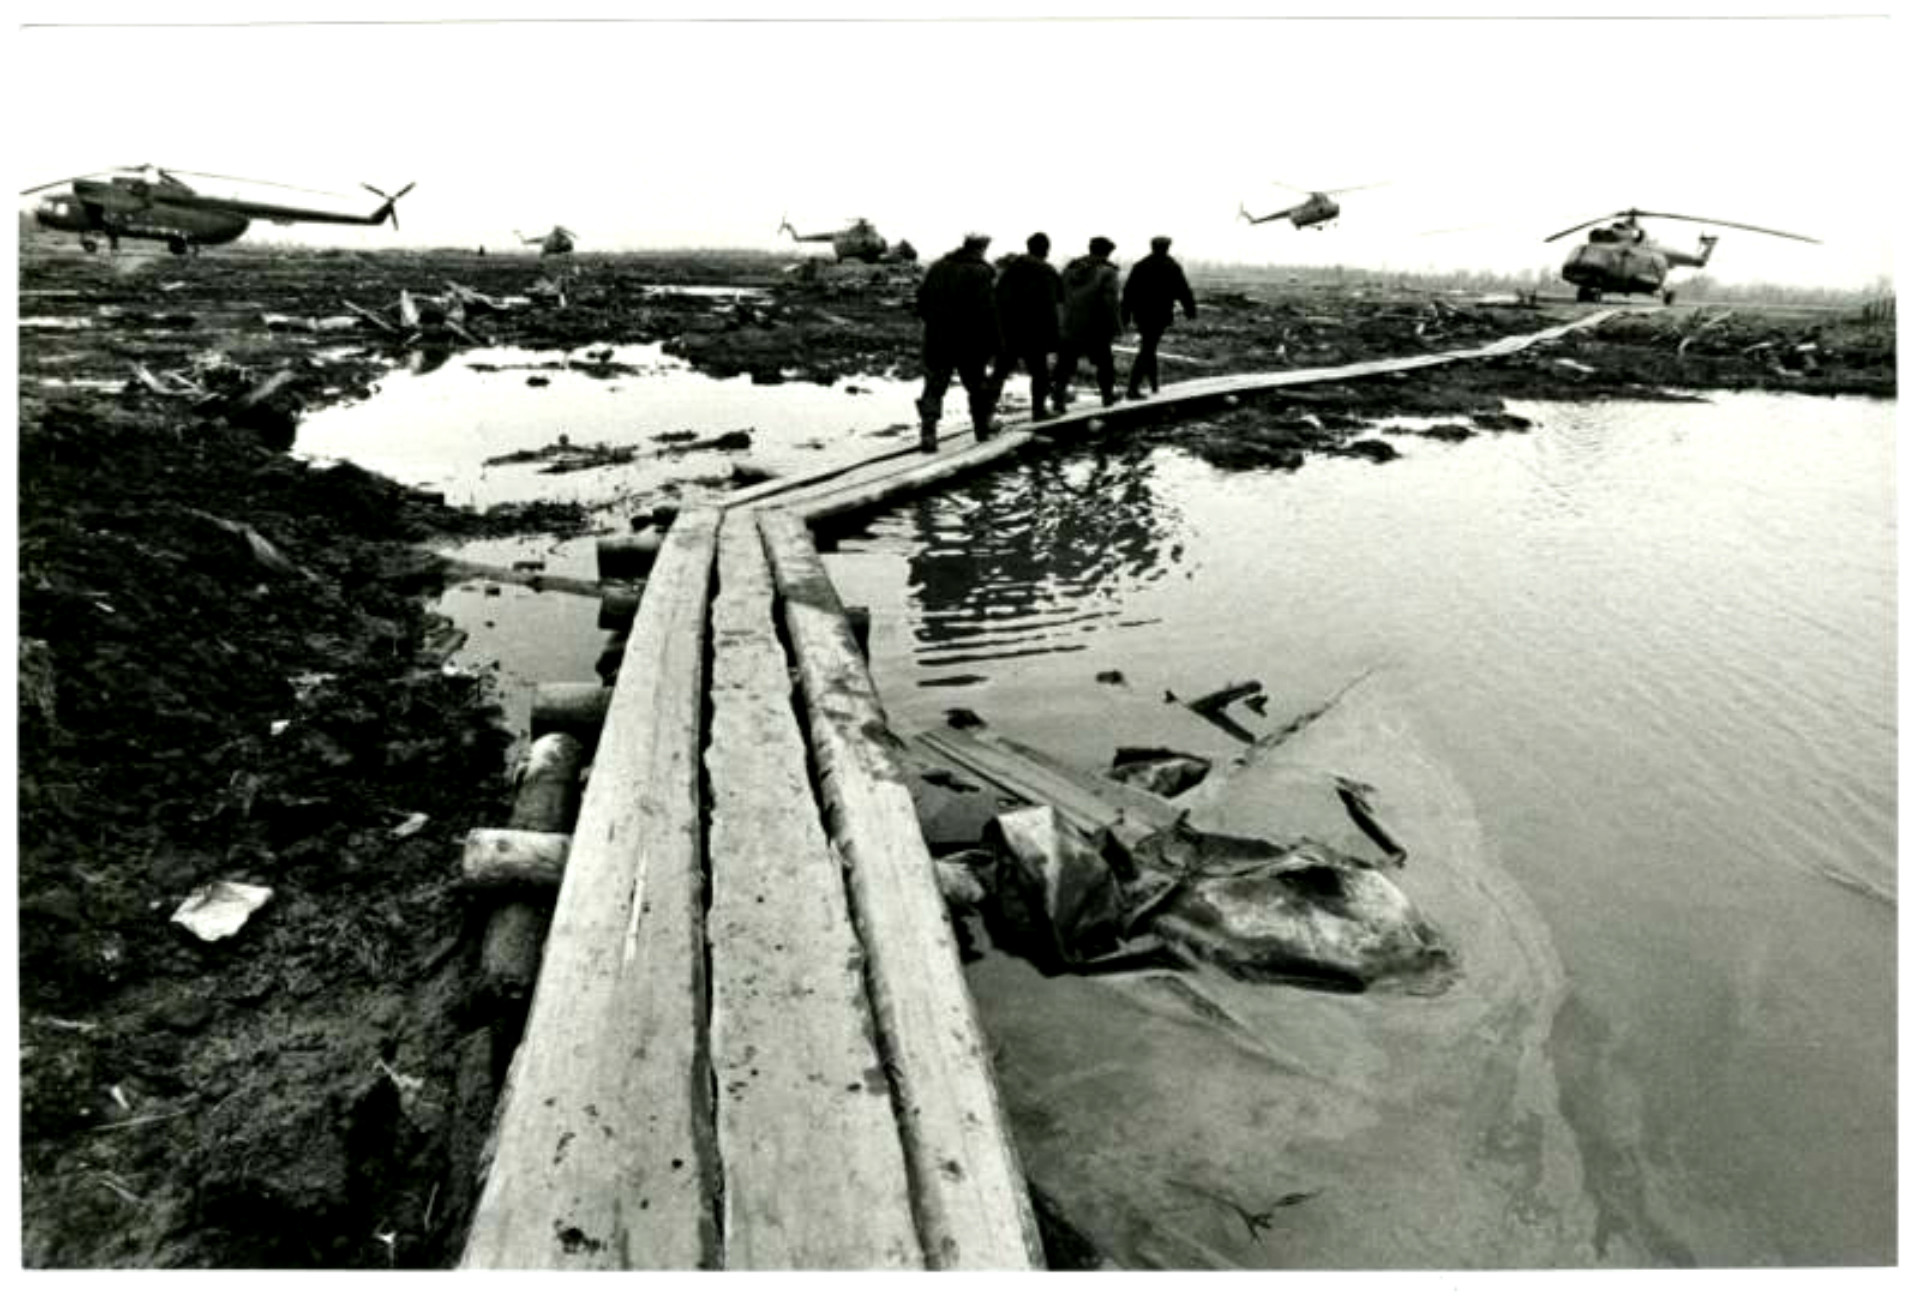 1968, Tjumenska regija.